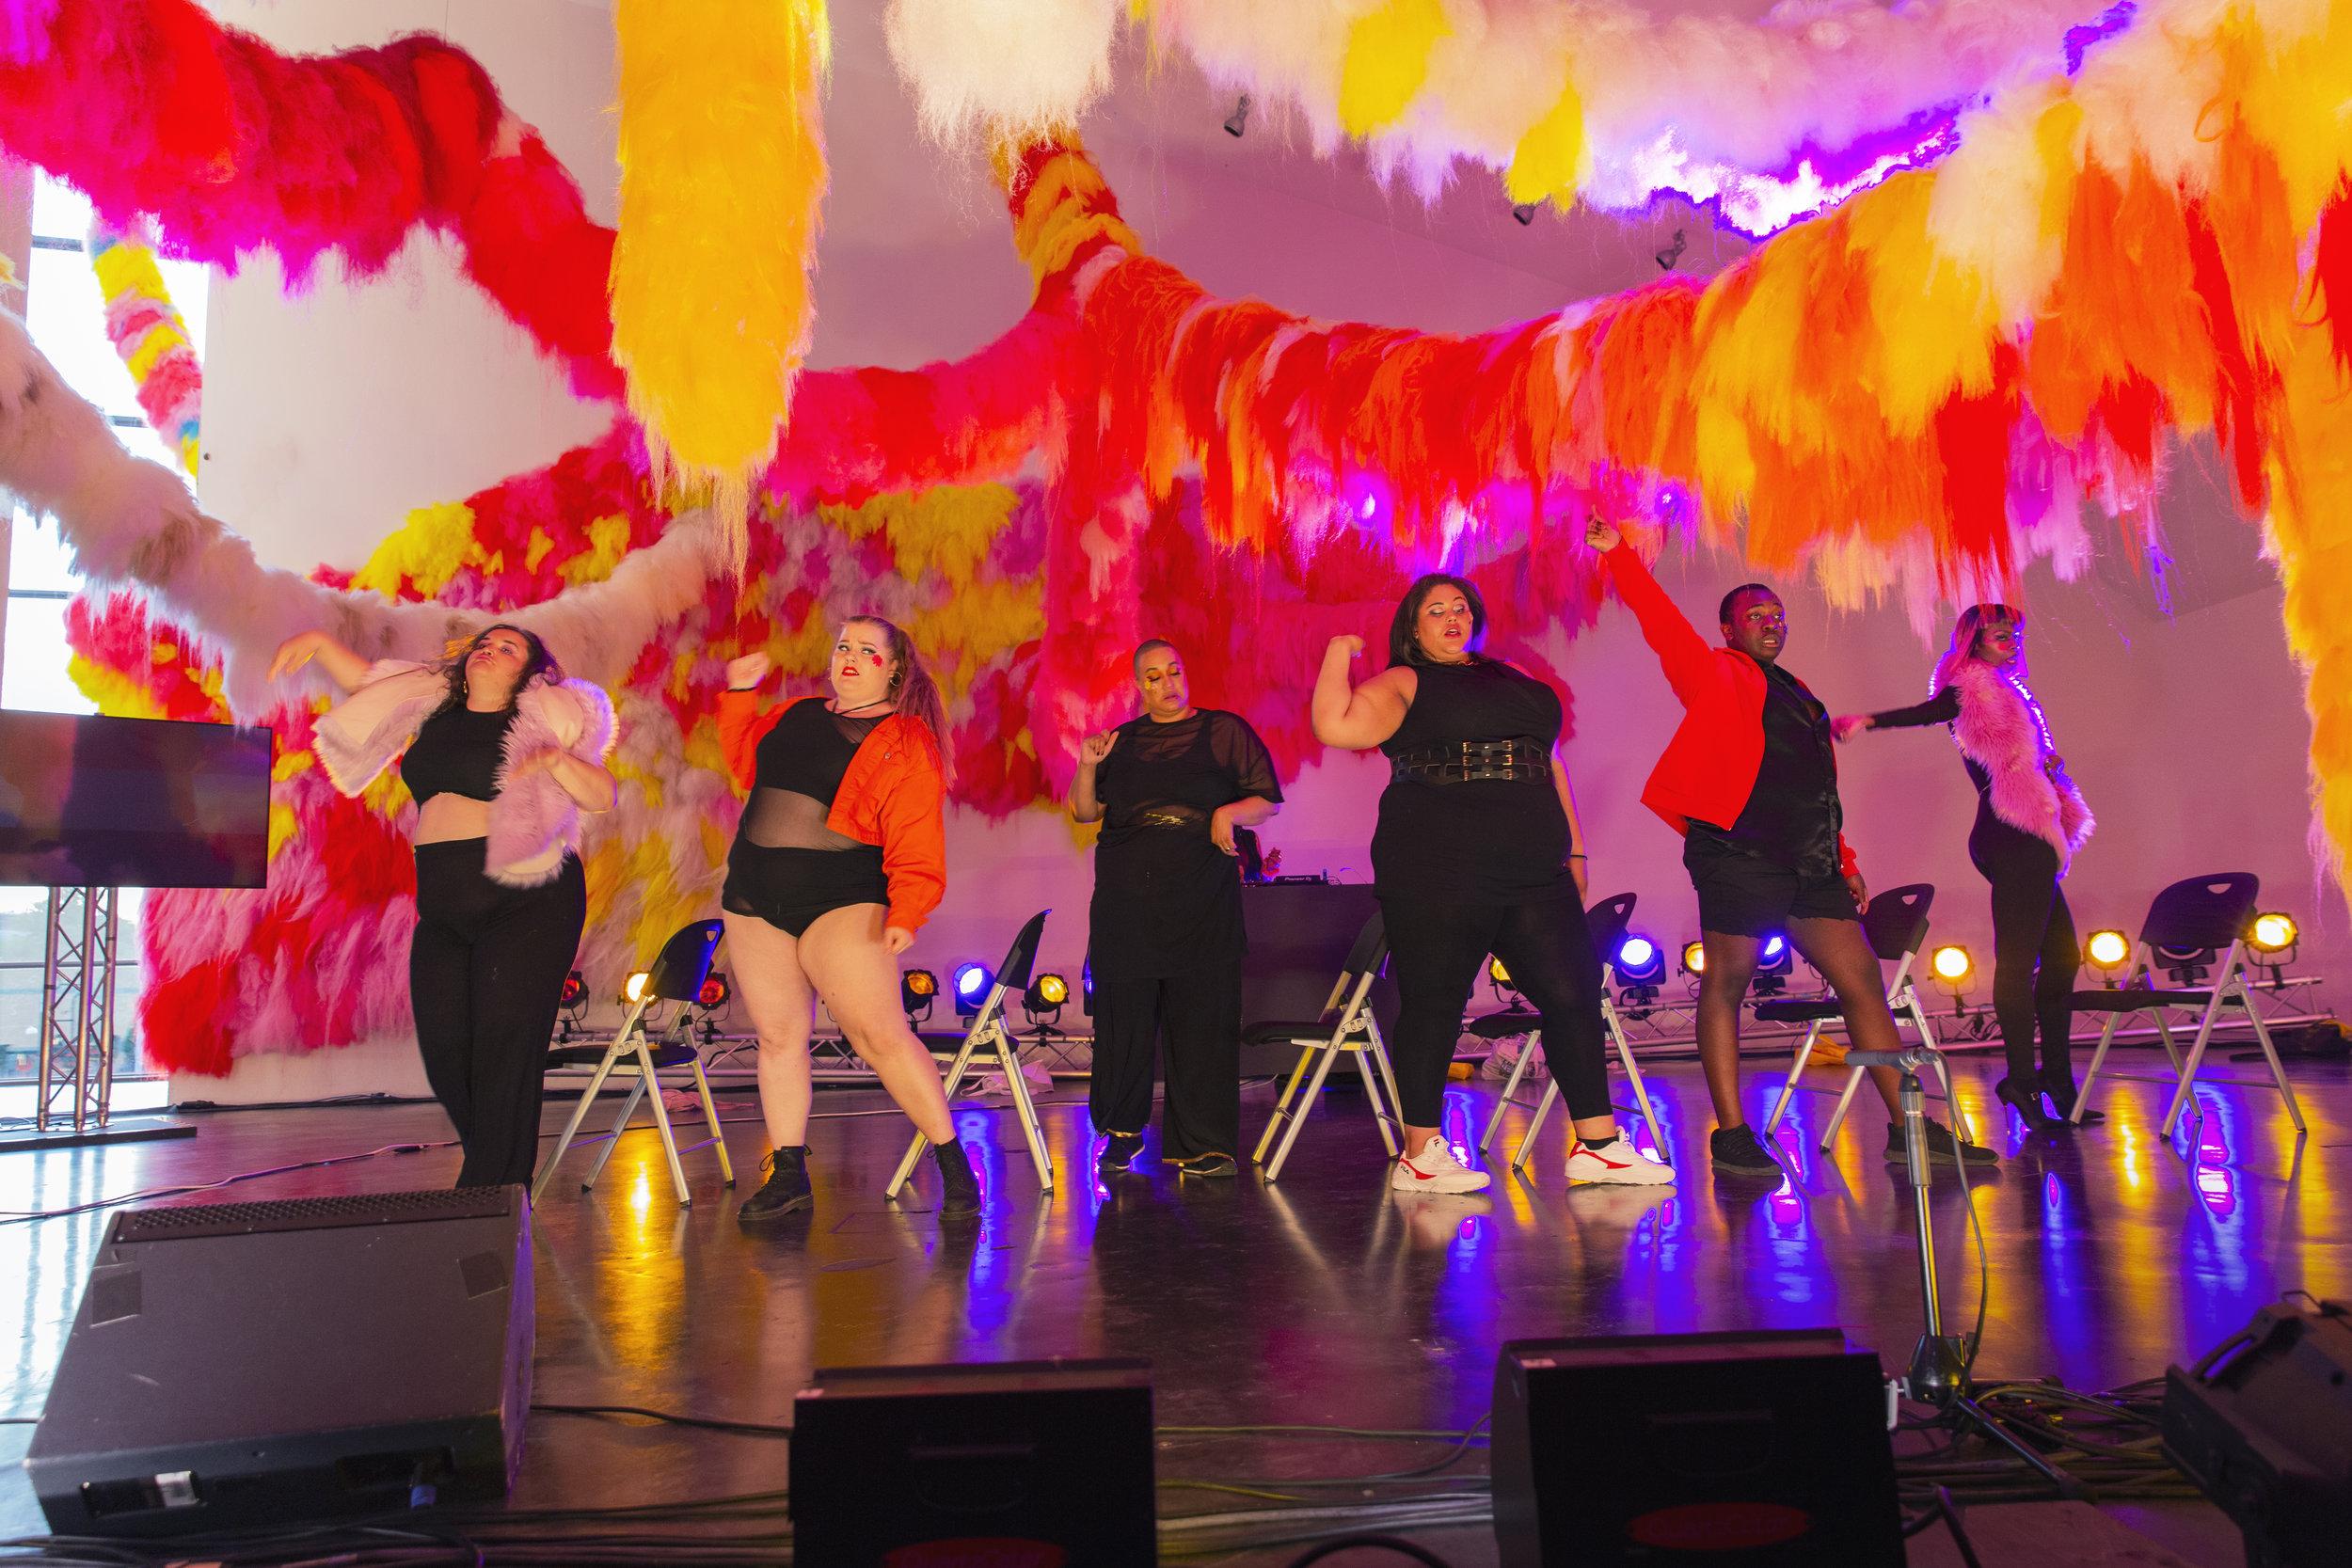 Meriam Trabelsi, Aino Tervo, Caroline Suinner, Adasha Moore, Glen Odhiambo, Angel in a piece directed by Sophia Wekesa